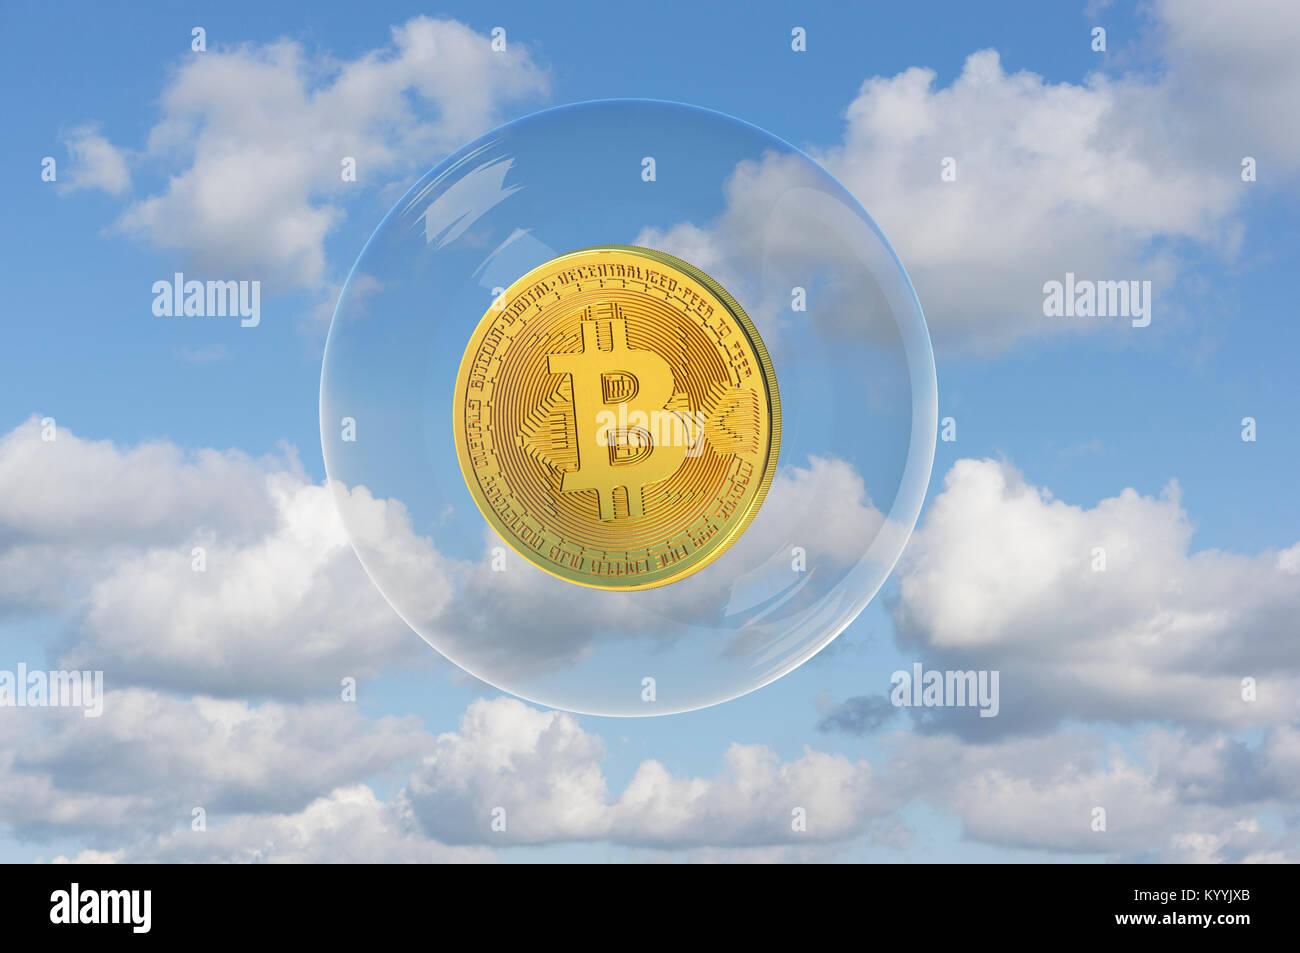 Bitcoin floating in a bubble - Bewertung Konzept Stockbild